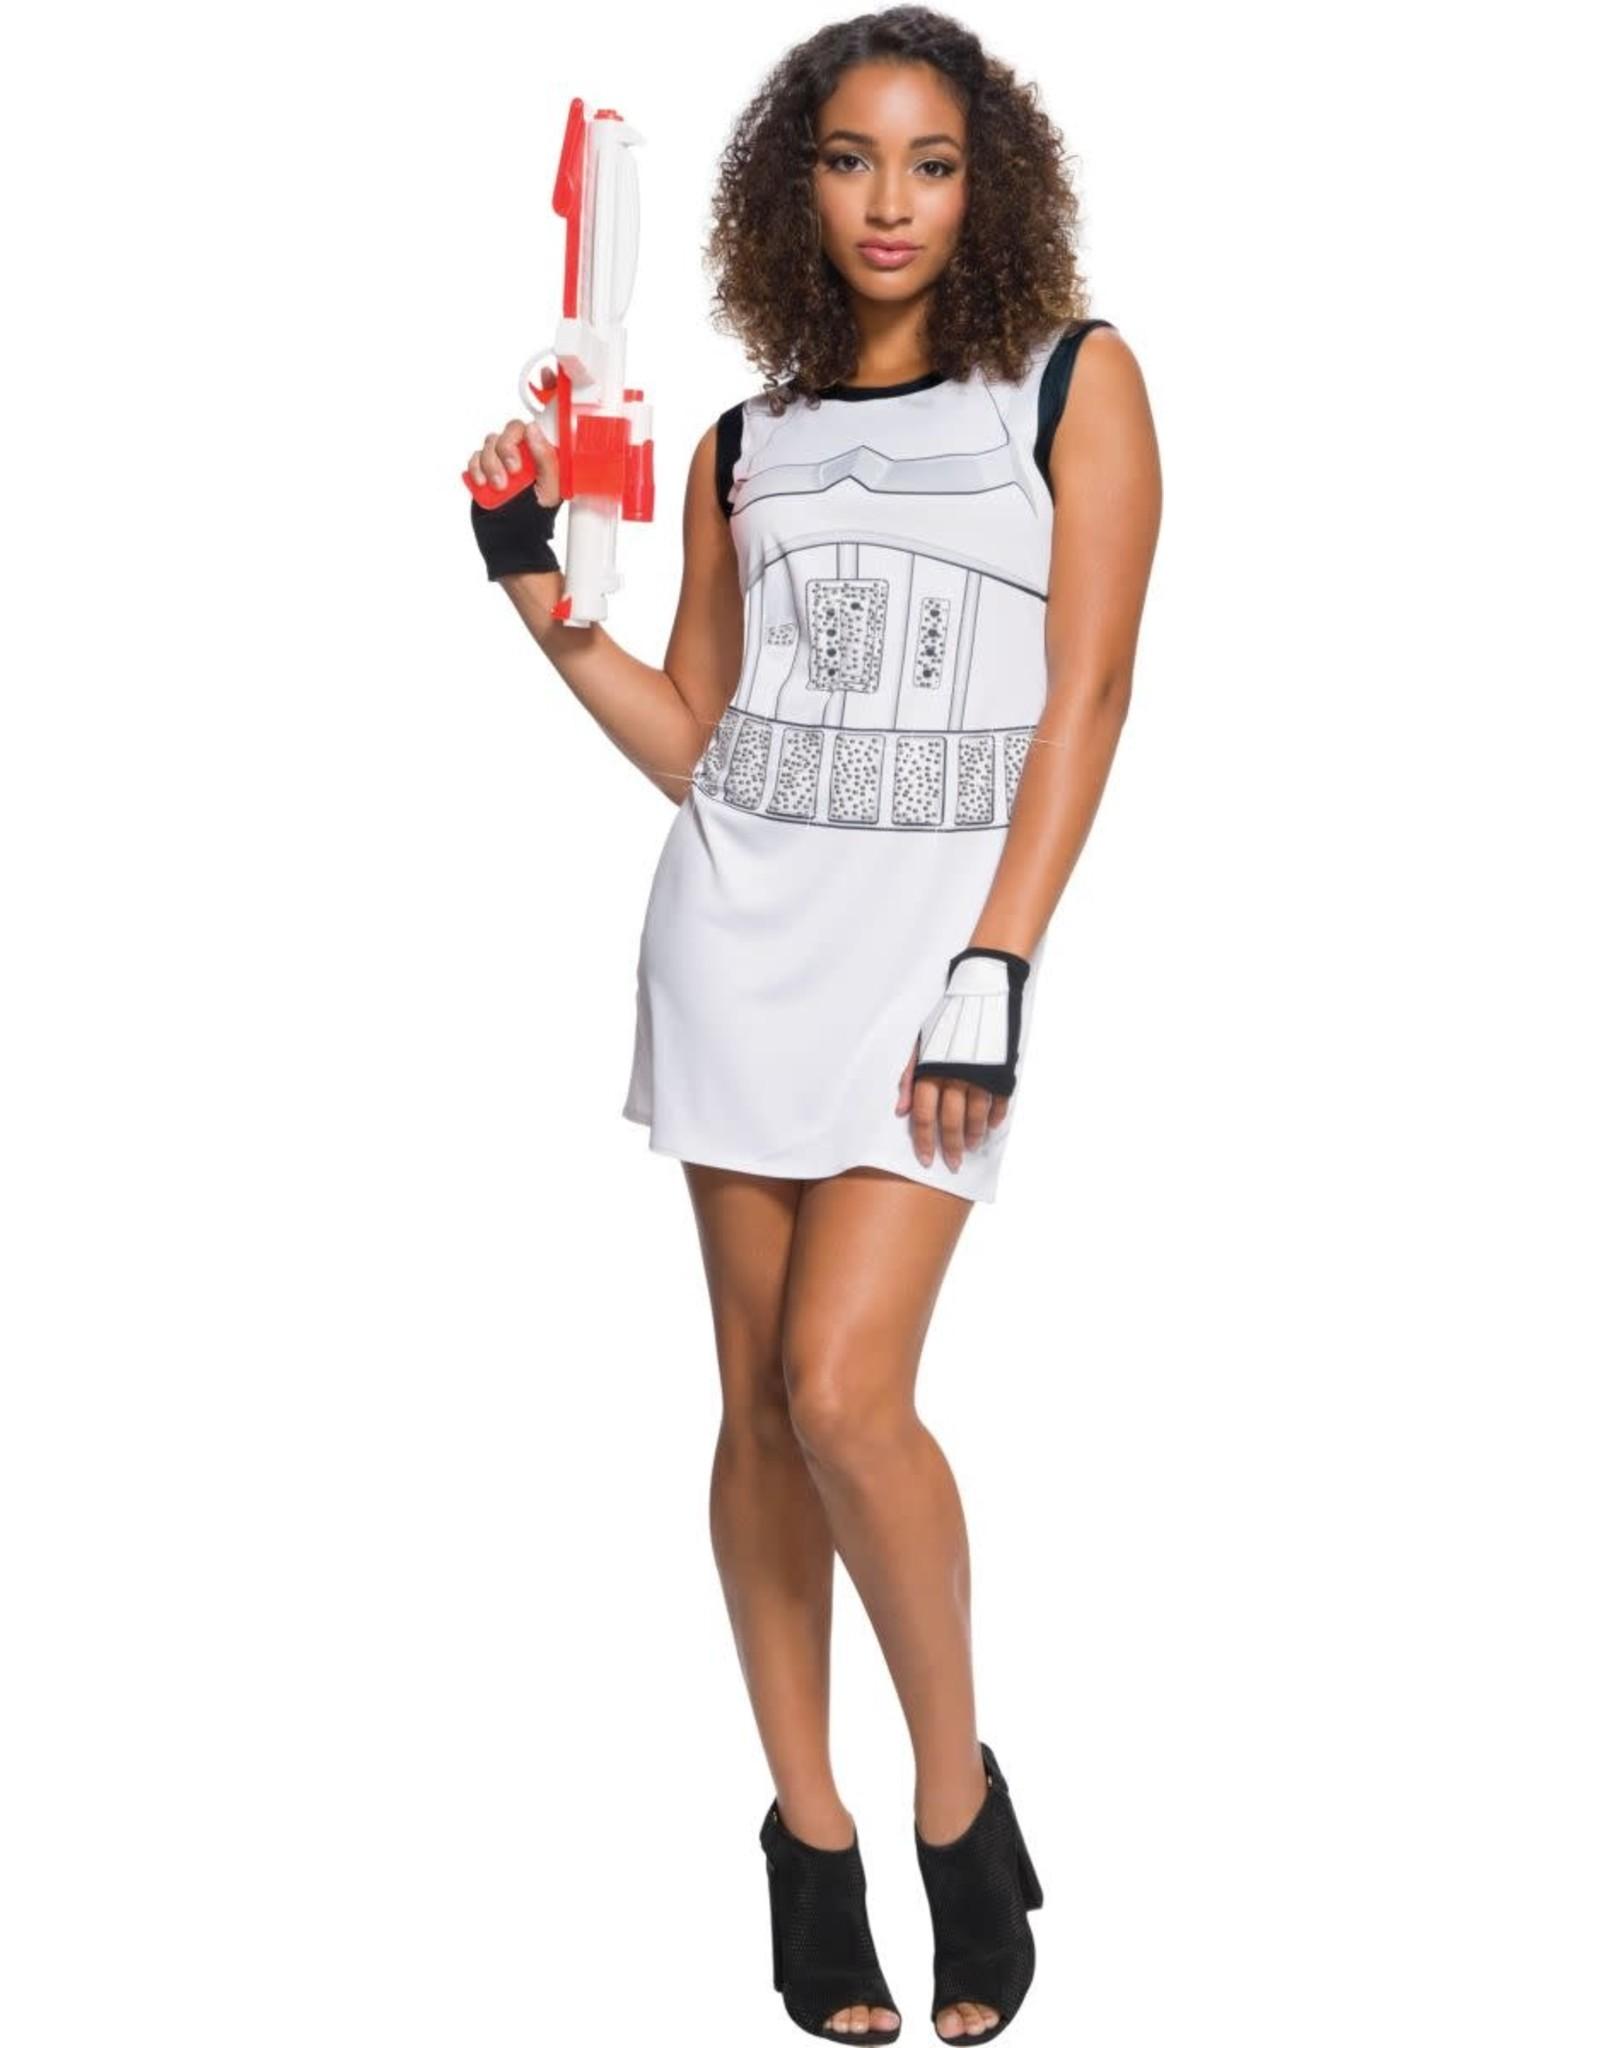 Rubies Costume Stormtrooper Rhinestone Tank Dress